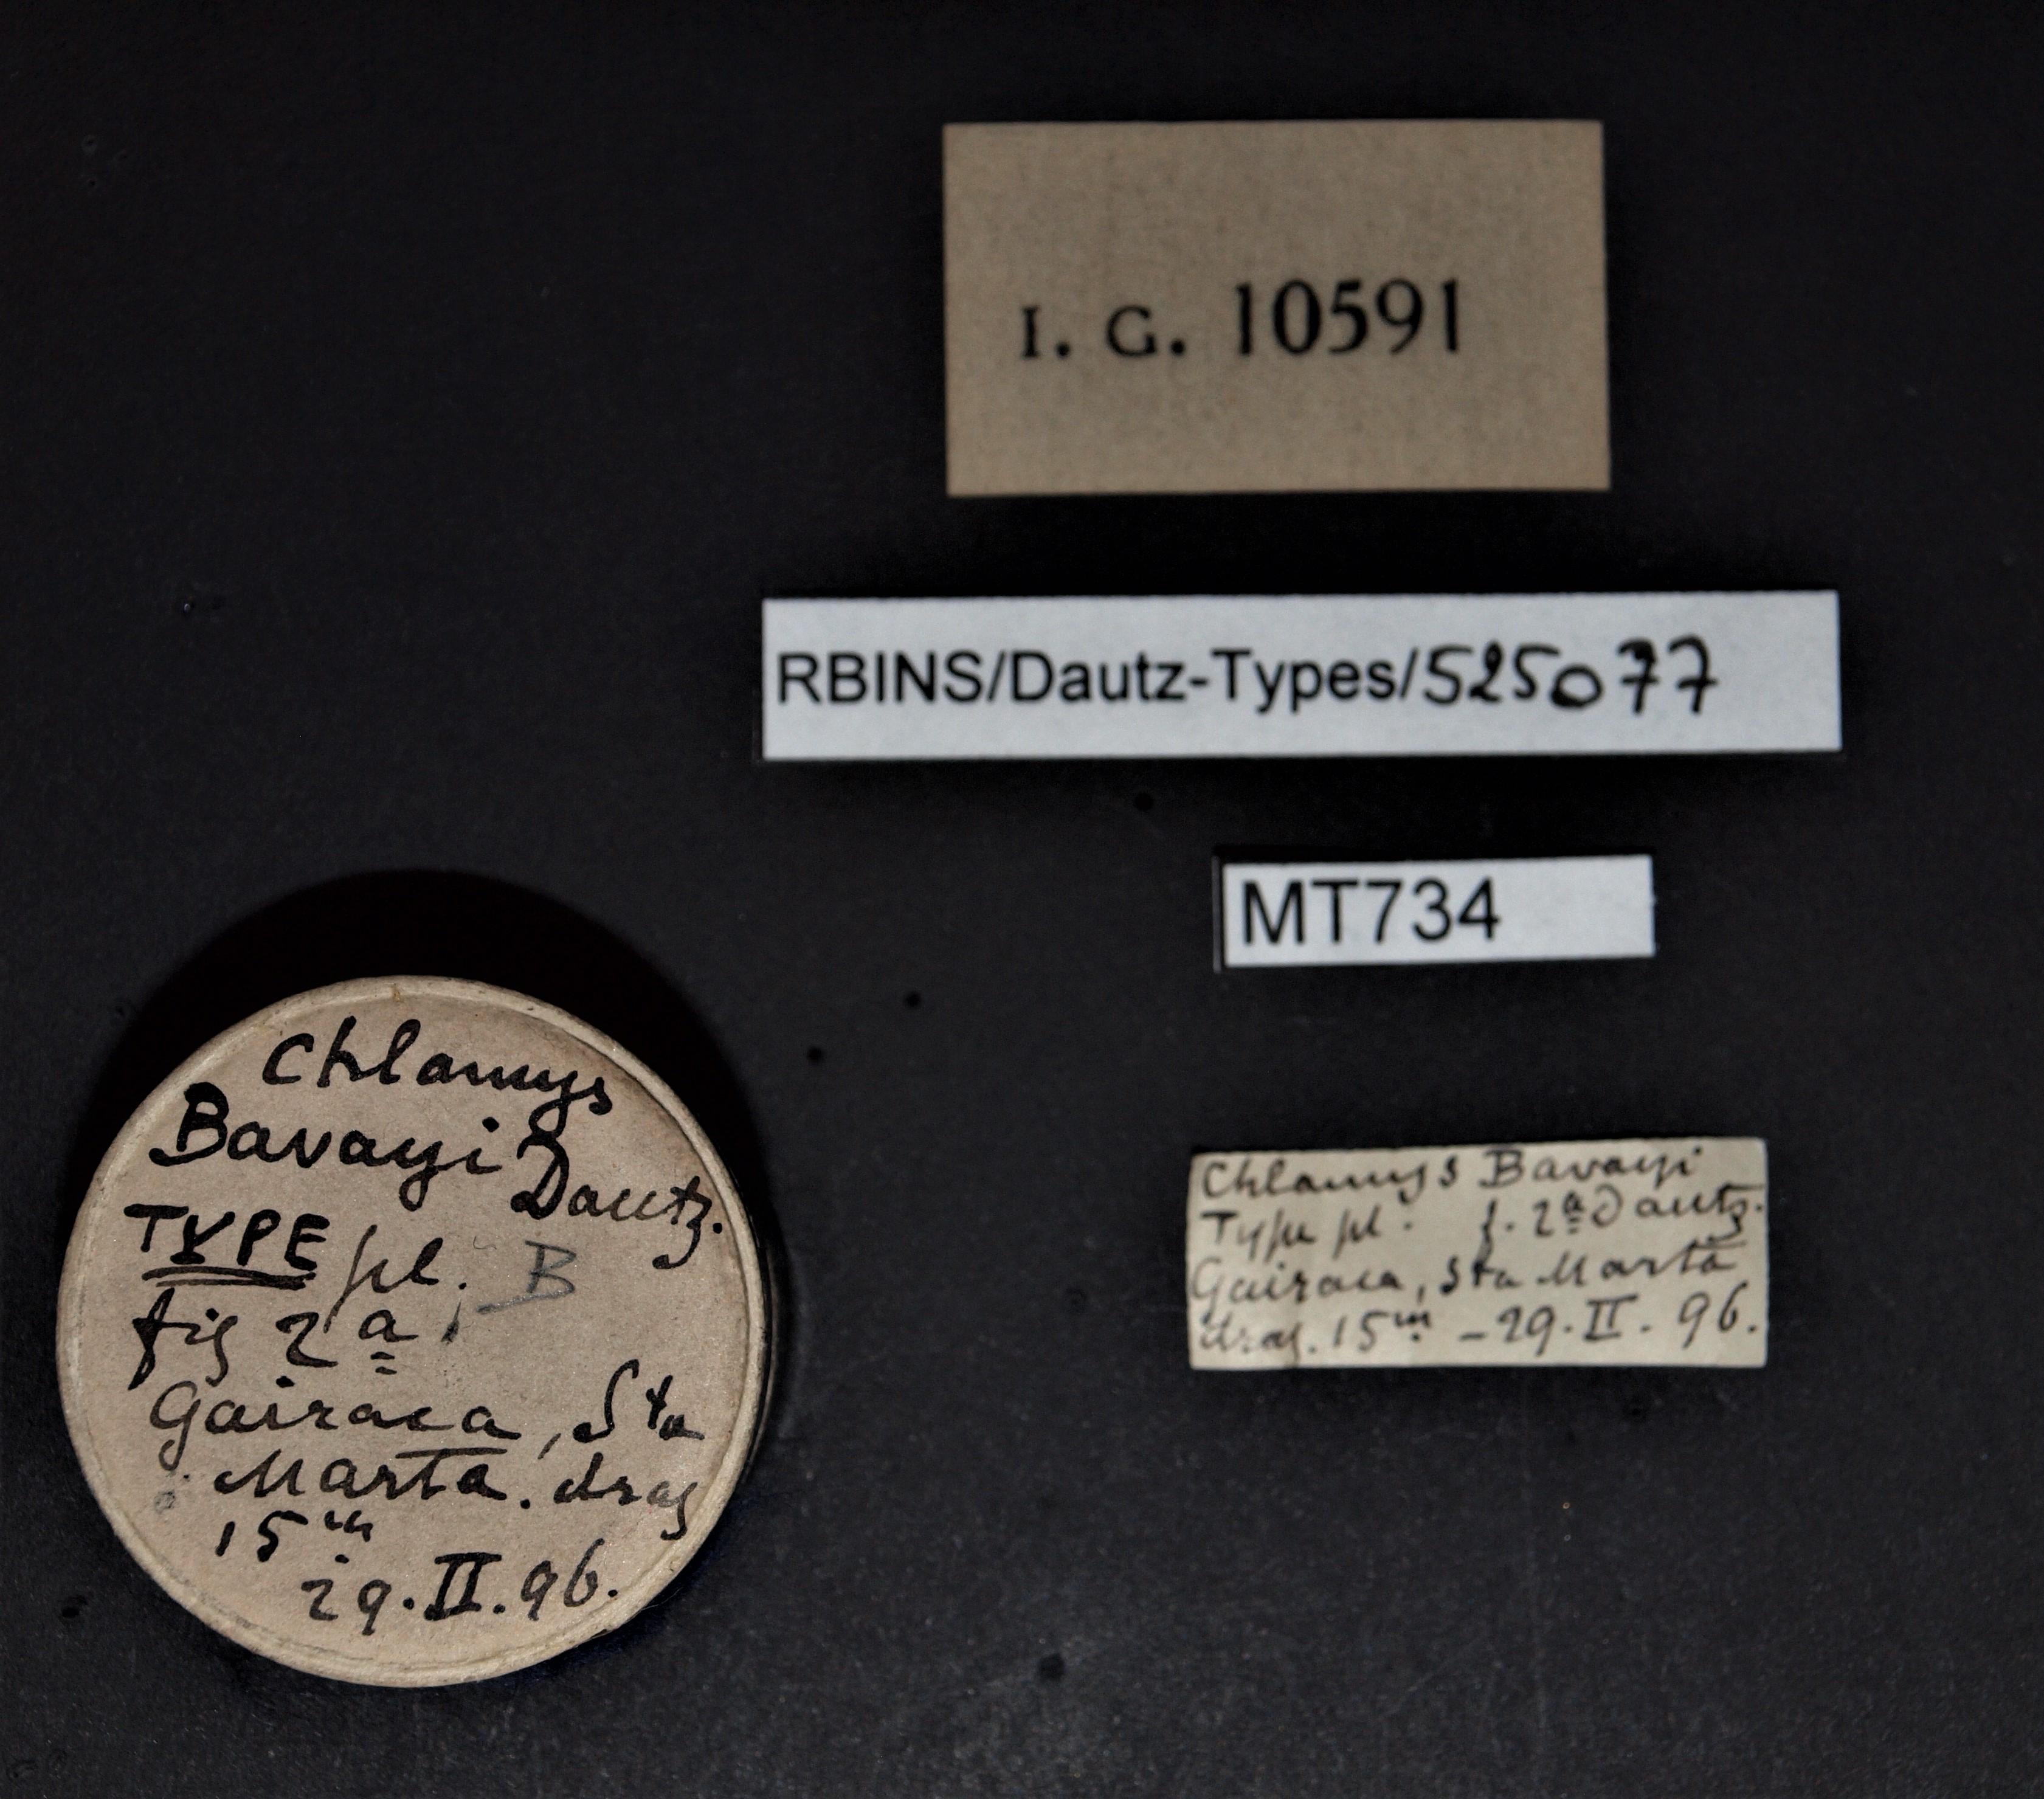 BE-RBINS-INV MT 734 Chlamys (Aequipecten) bavayi t Lb.jpg